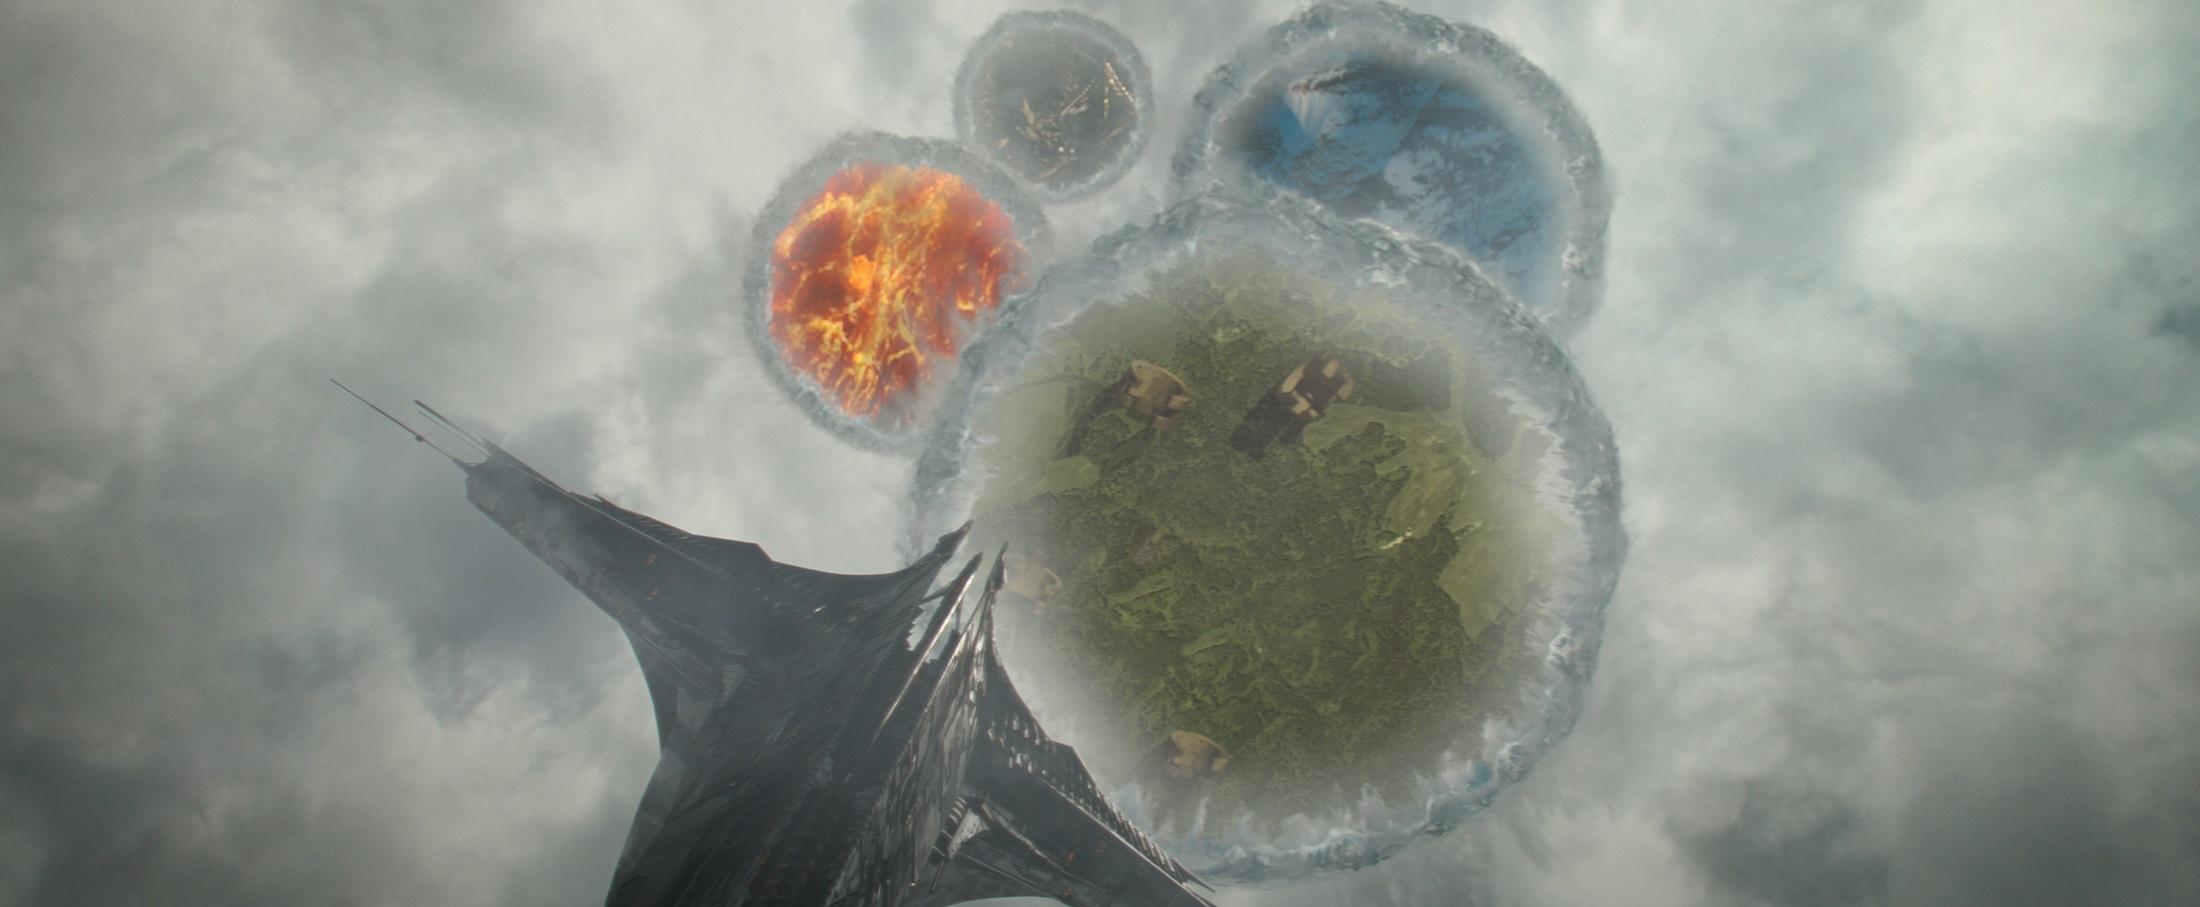 Thor: The Dark World - Página 16 Thor_Portals